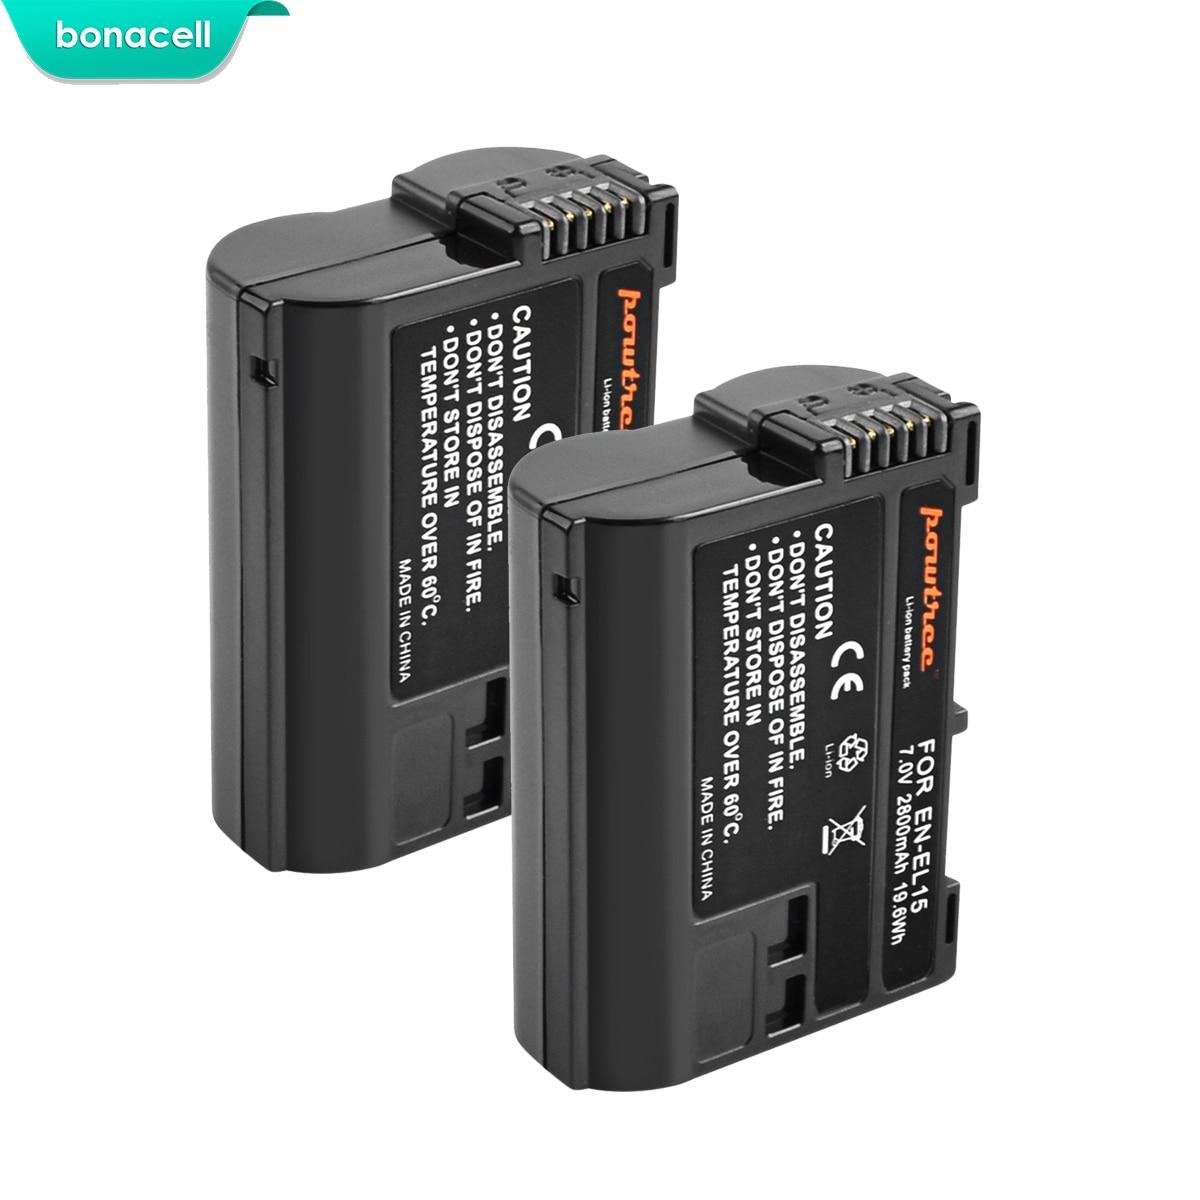 Unterhaltungselektronik 3 X En-el15 En El15 Digital Batterie Für Nikon D7200 Slr Kamera Batterie D7000 D7100 D7500 D610 D750 D810 D850 Z6 Z7 D500 Tracking Stromquelle